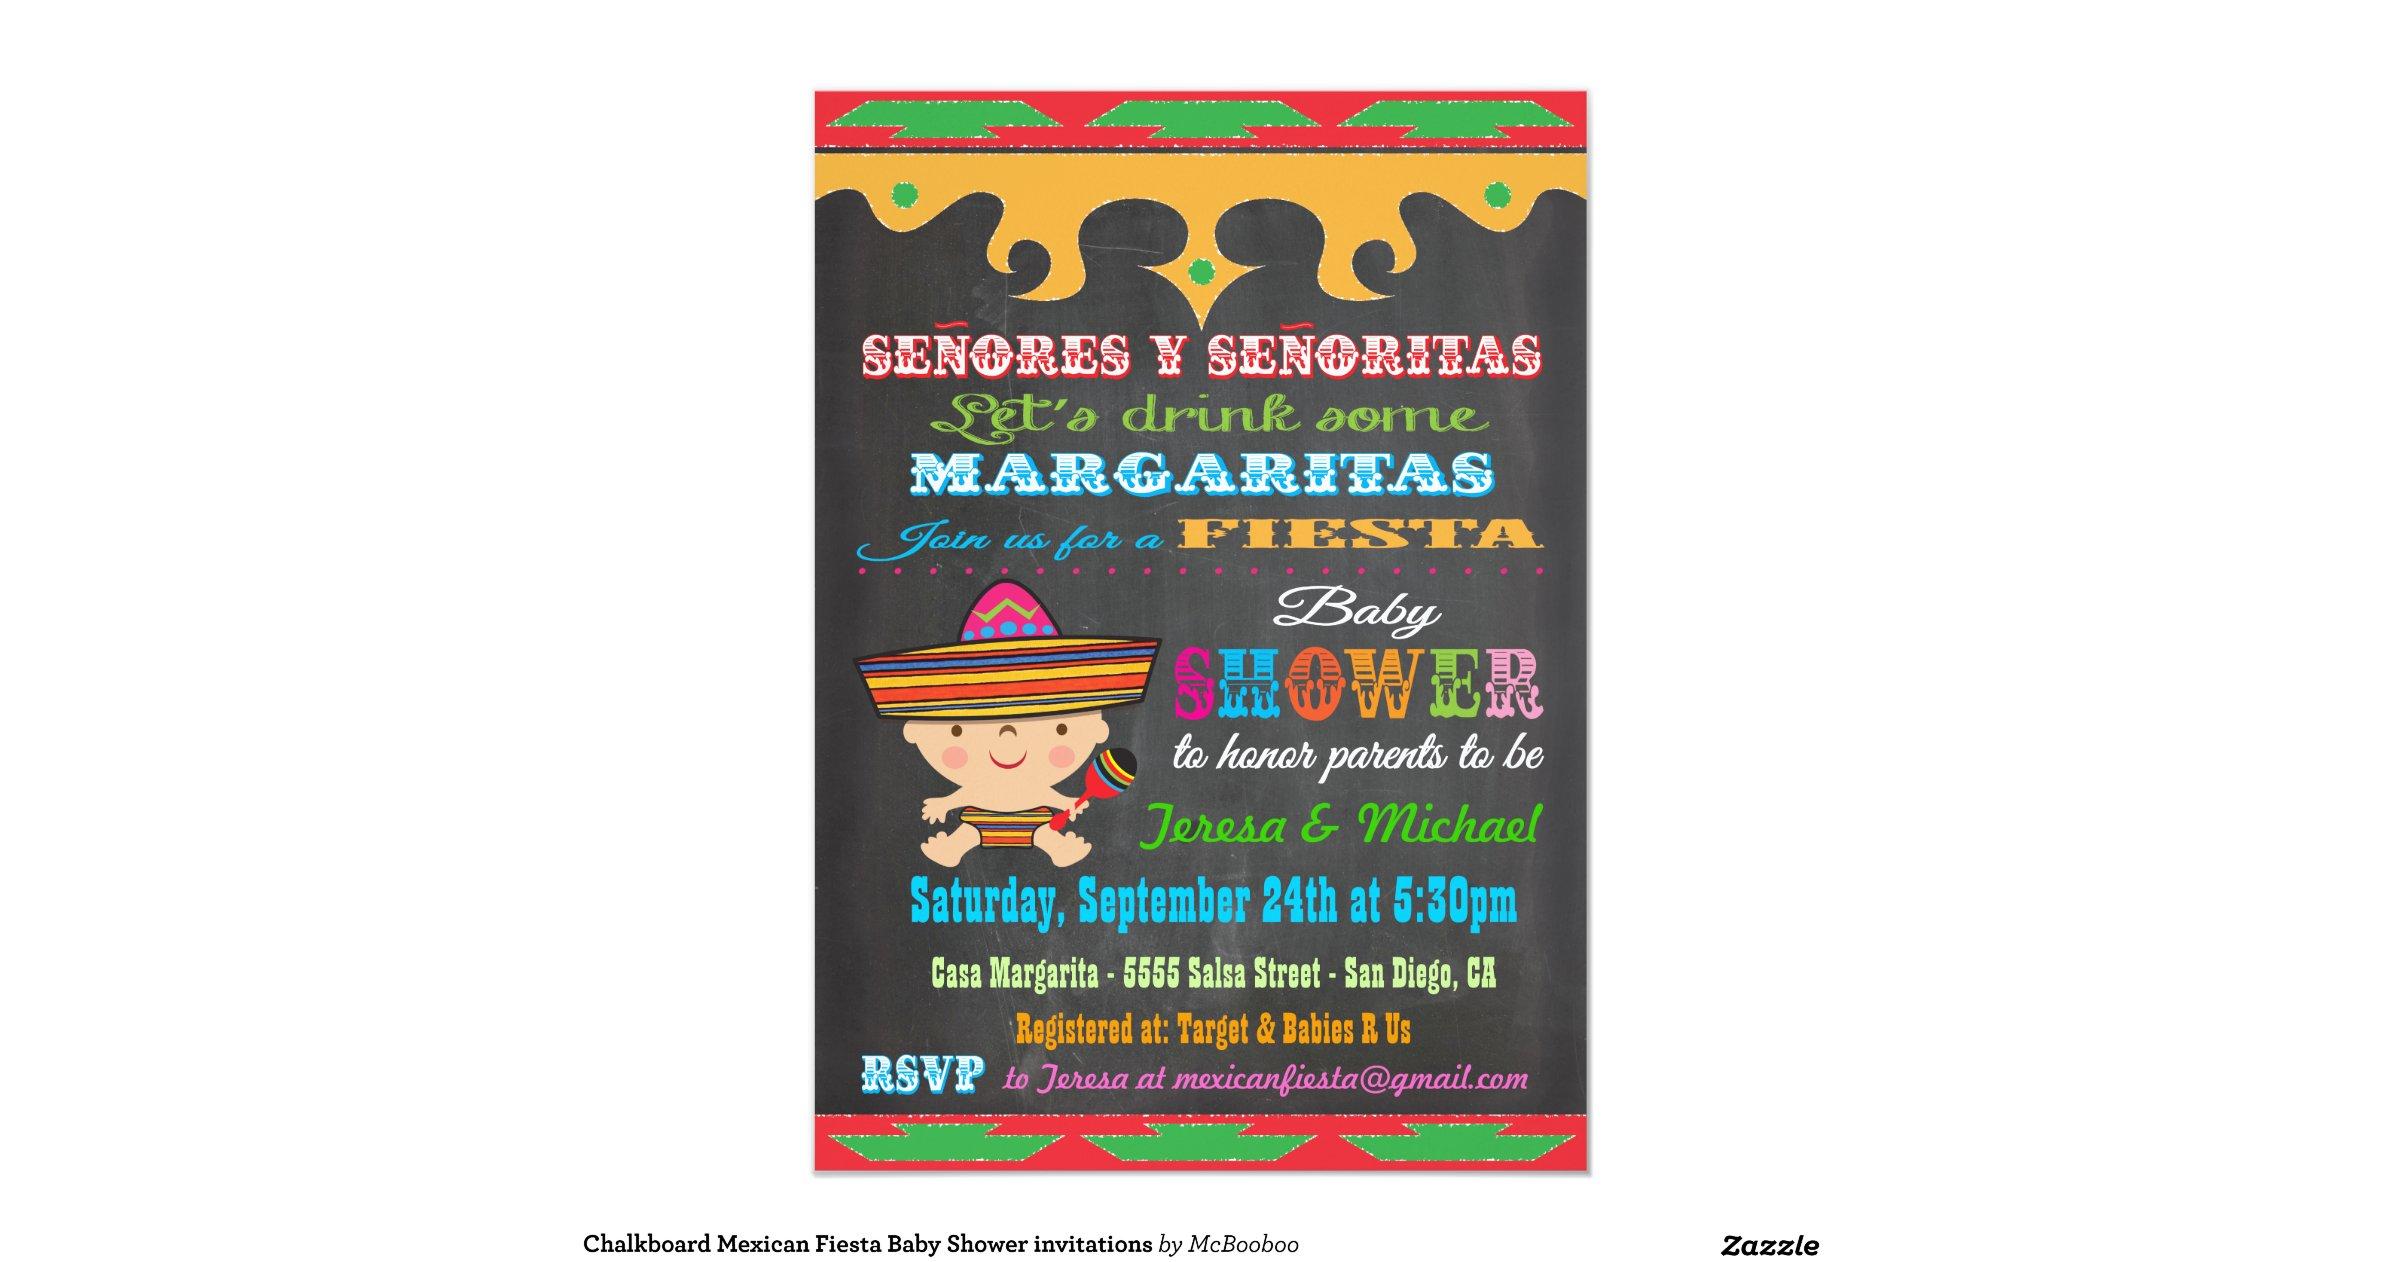 Chalkboard mexican fiesta baby shower invitations - Fiesta baby shower ...